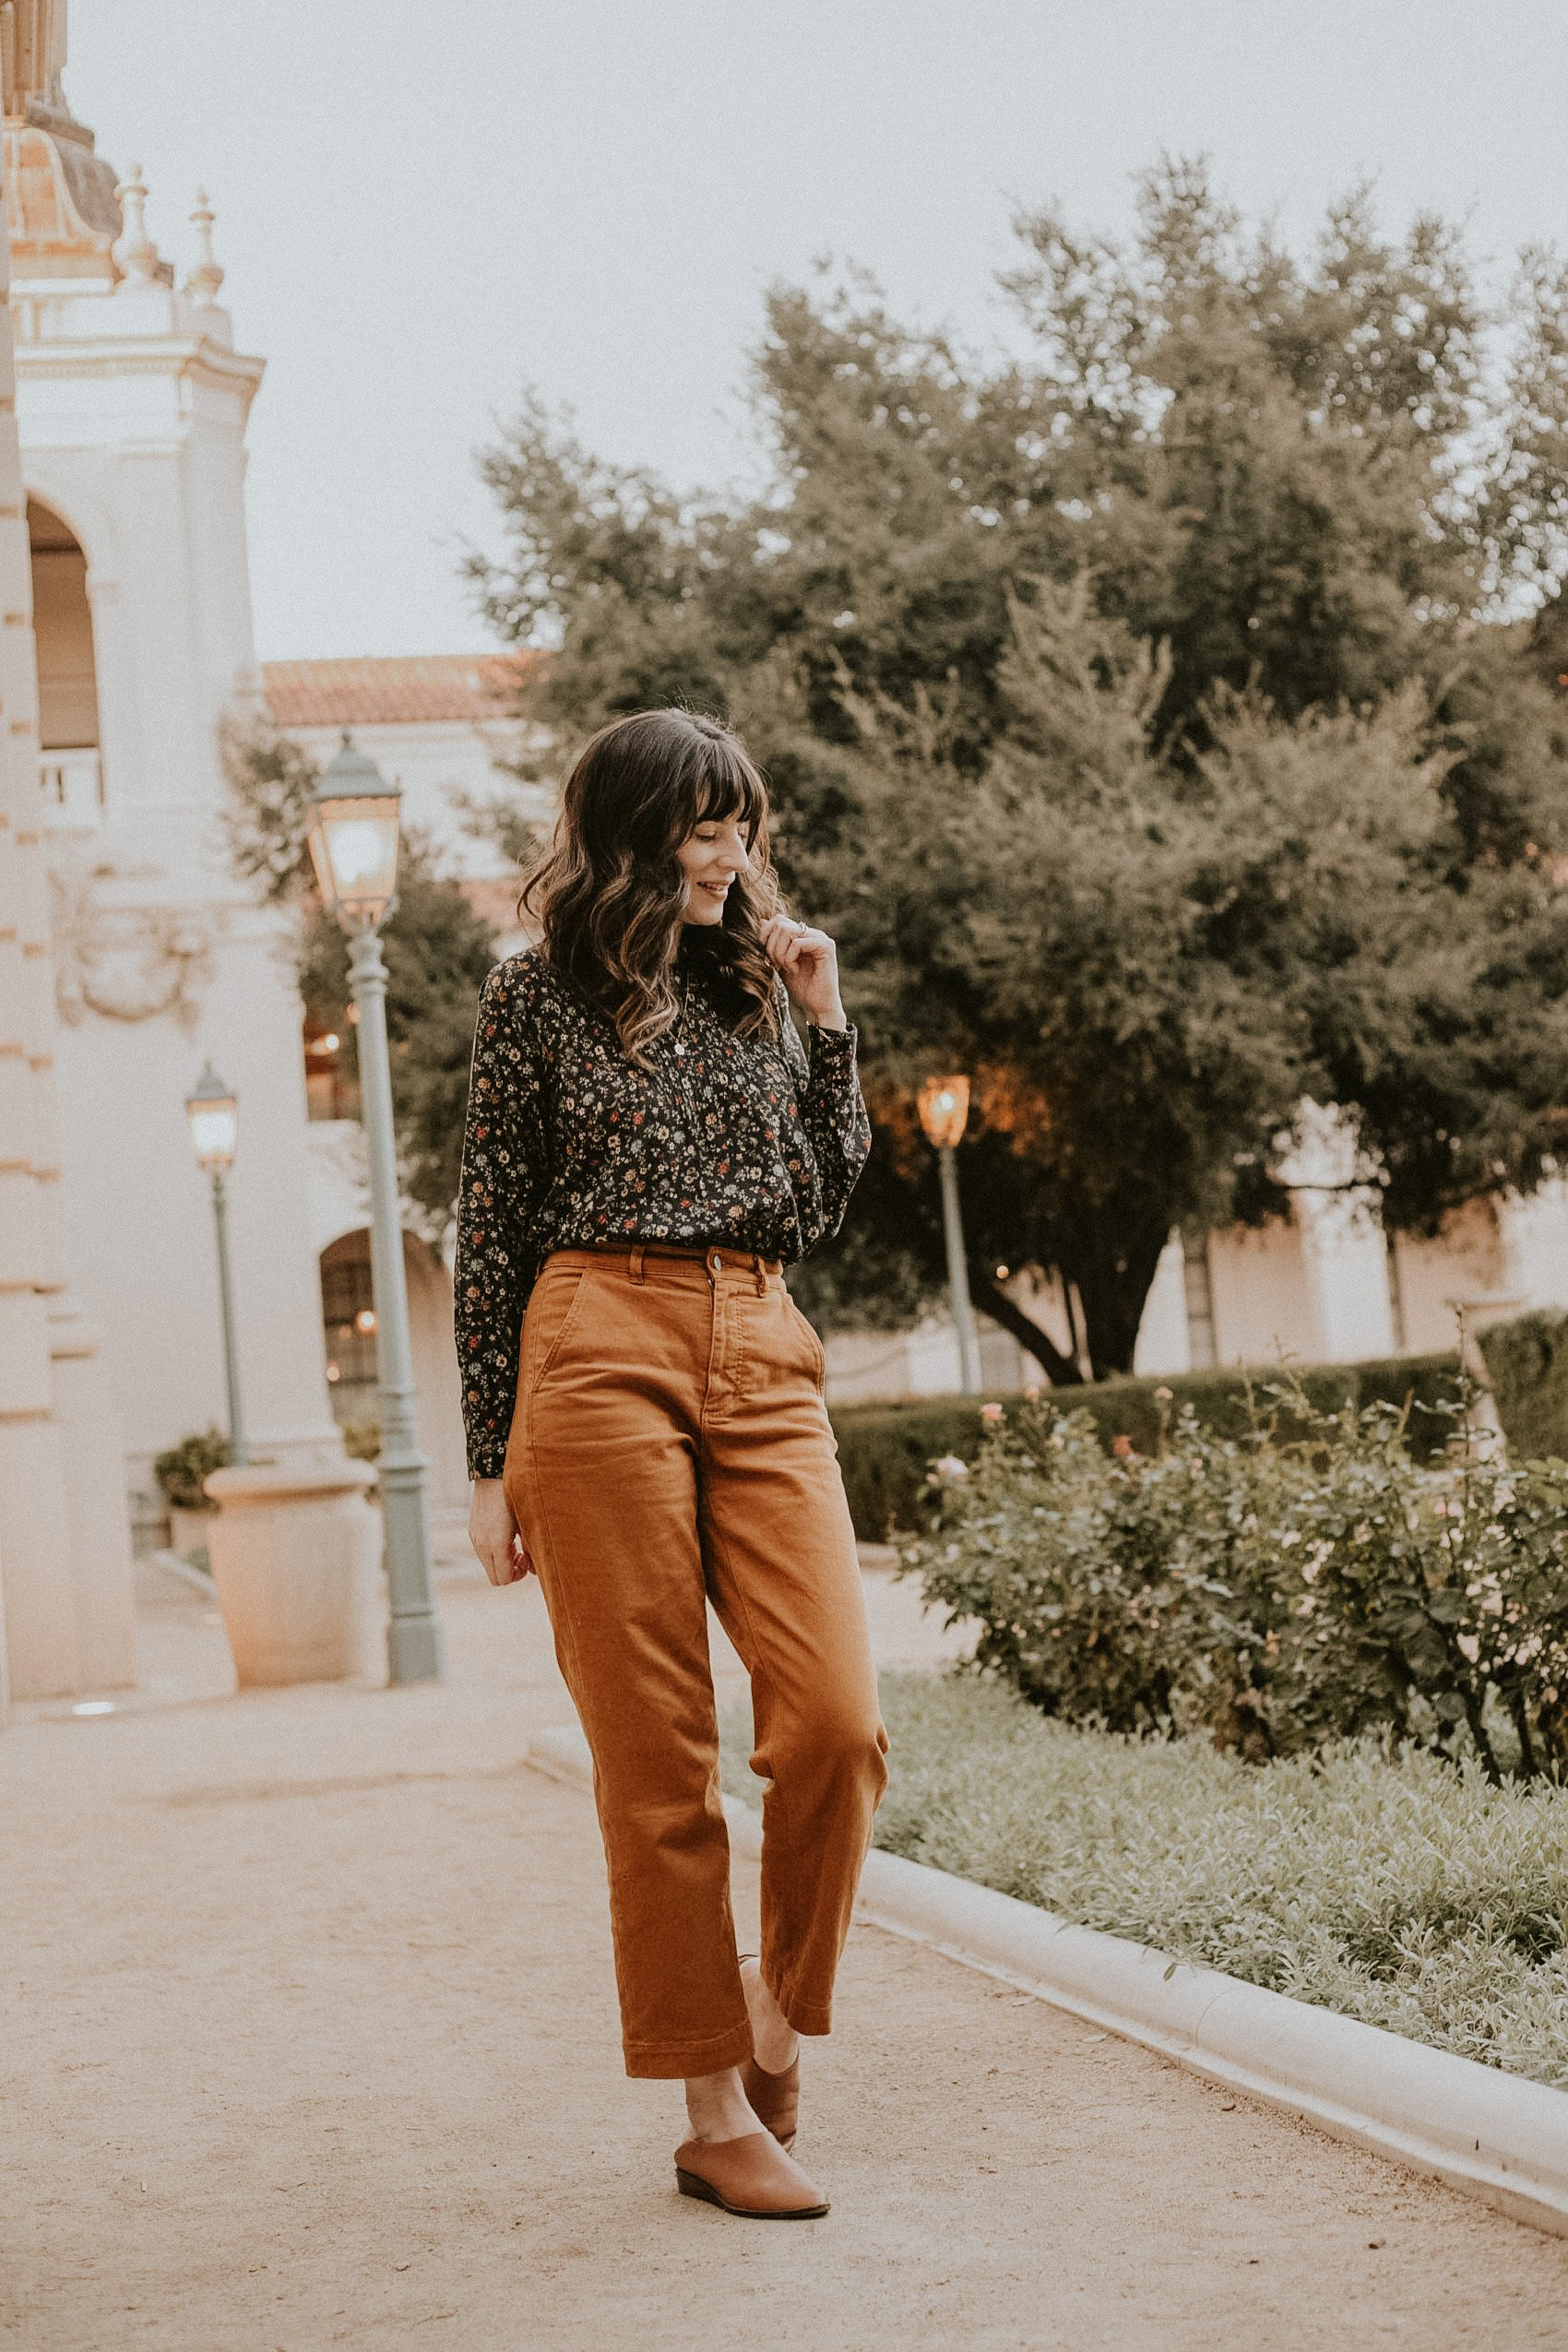 Doen Floral Top with Everlane Pants at Pasadena City Hall